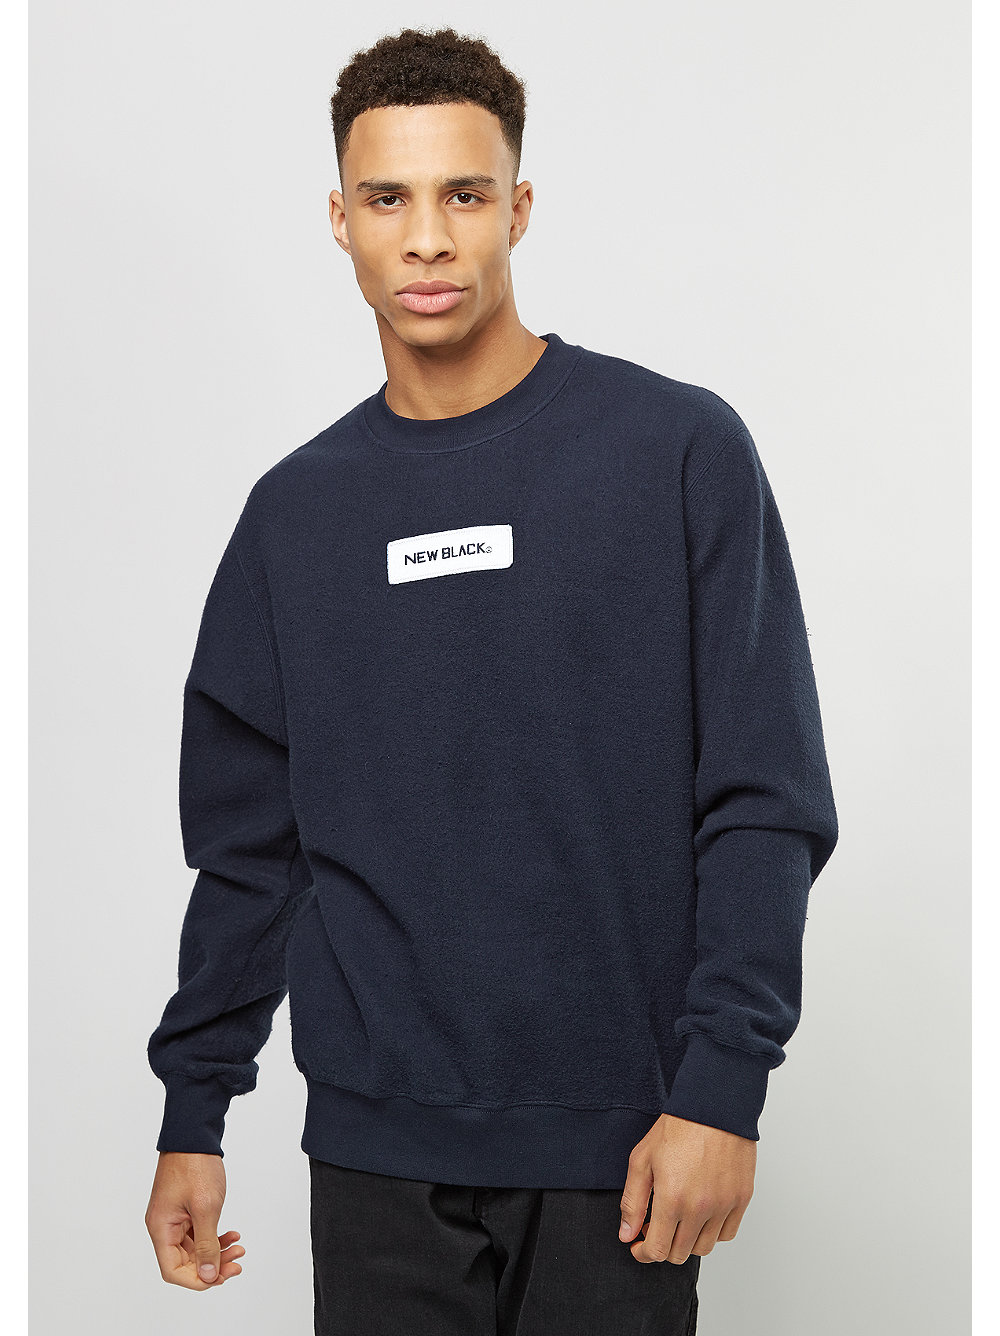 New Black Sweatshirt Little Logo navy